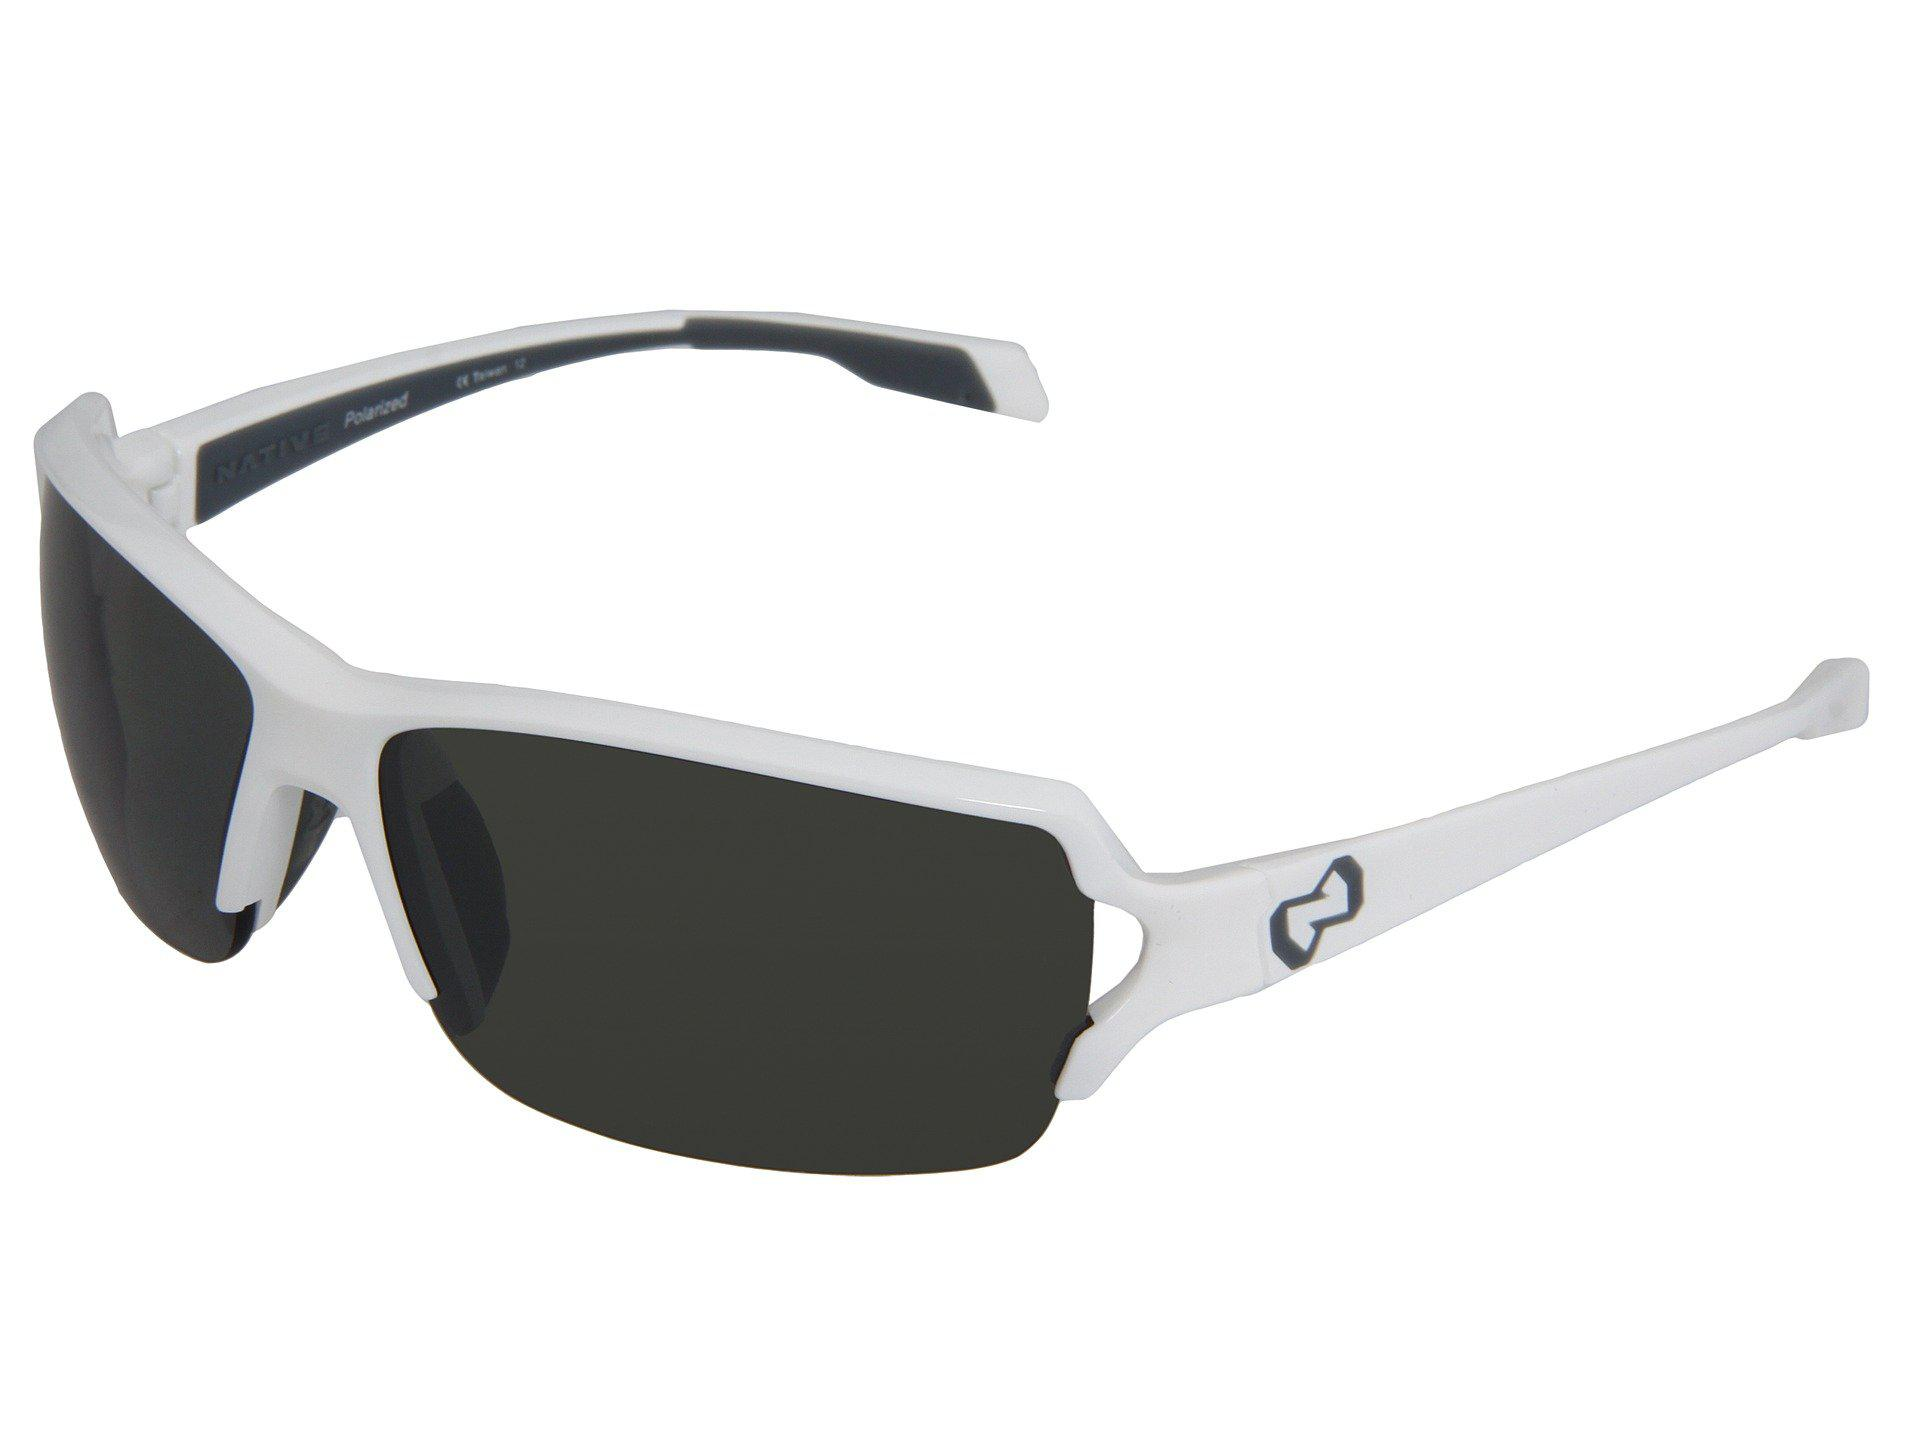 d0c50a5a84 Lyst - Native Eyewear Blanca Polarized for Men